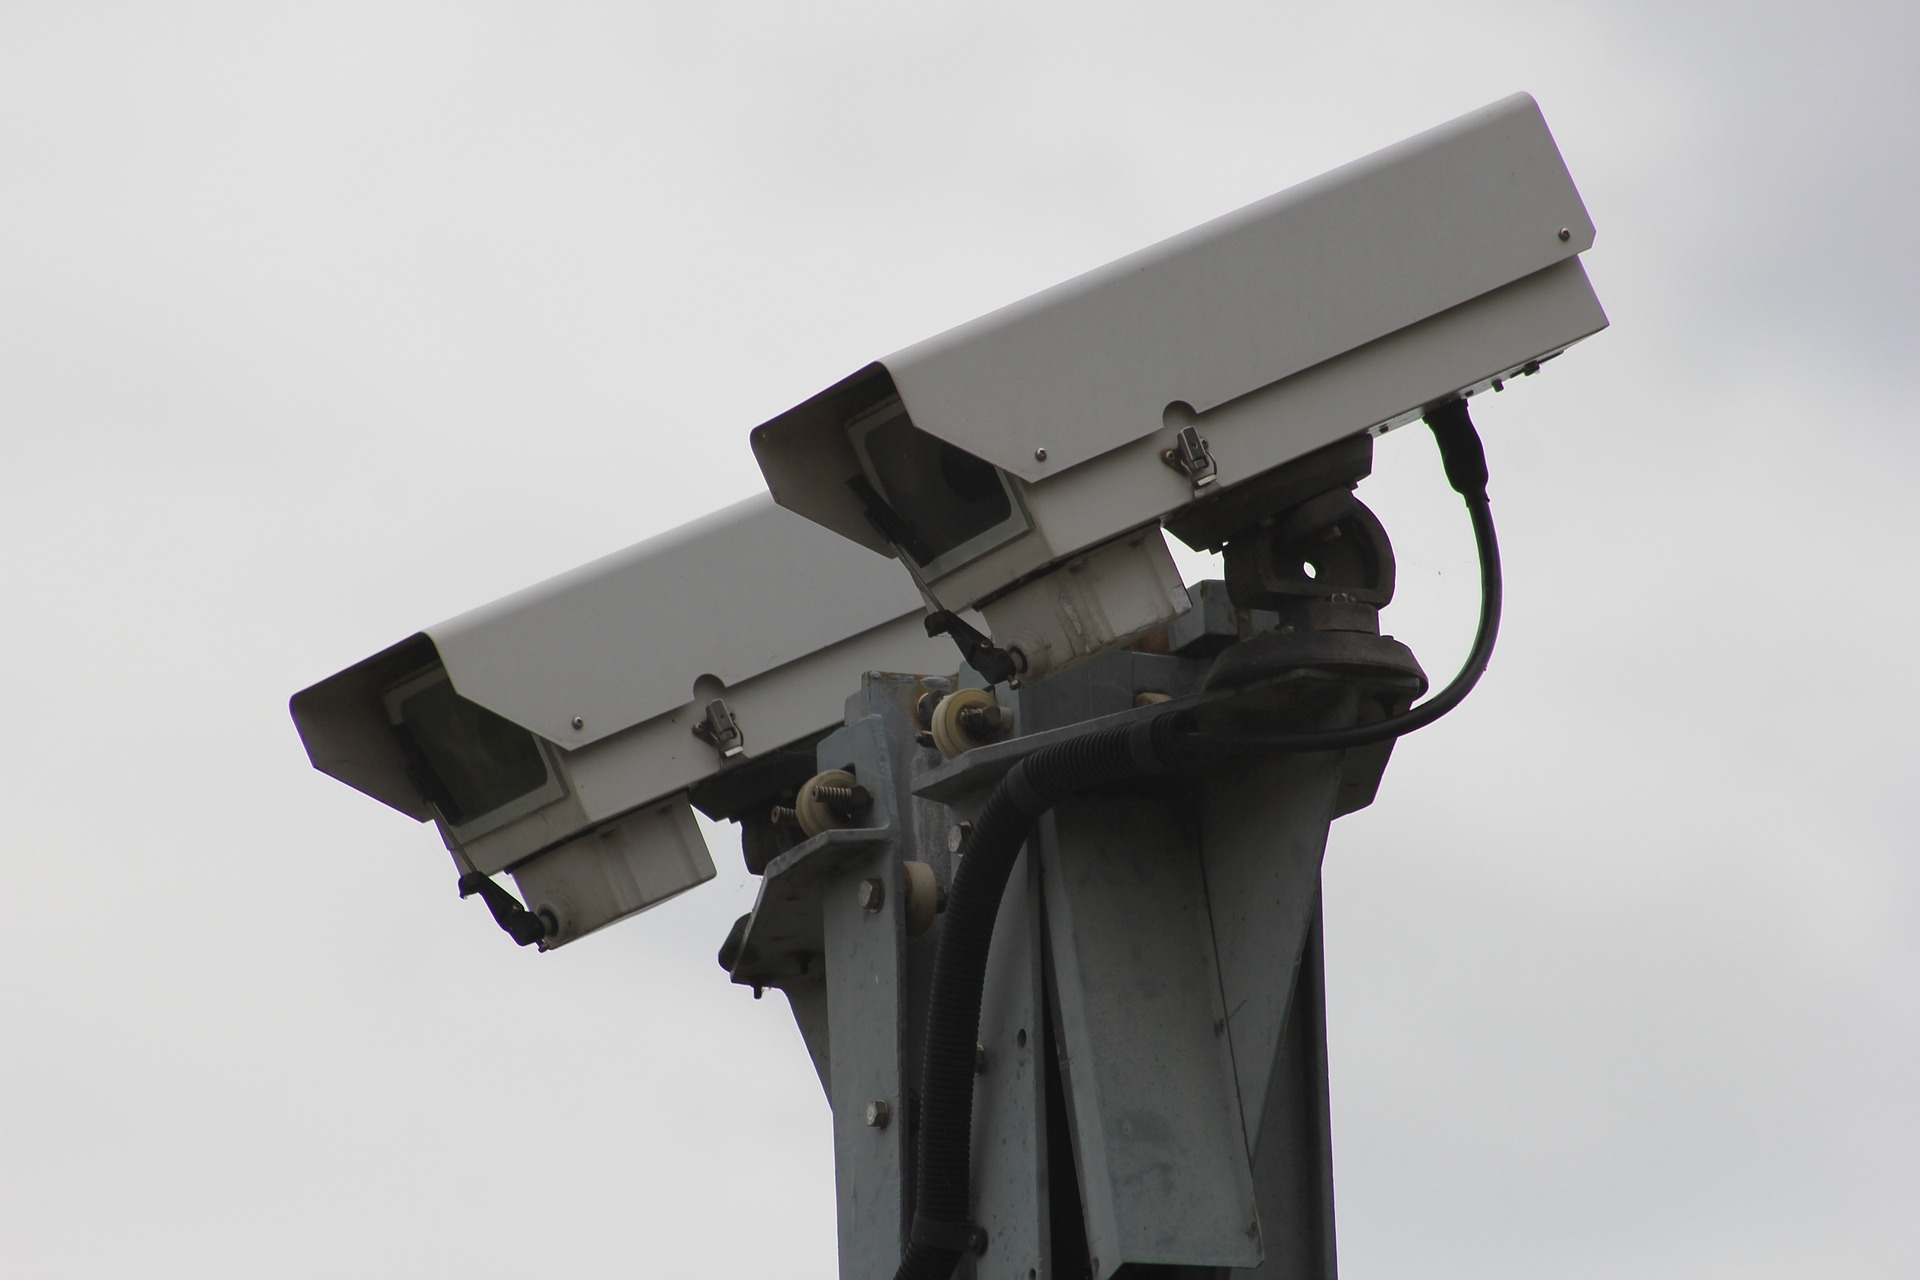 security-camera-834173_1920.jpg